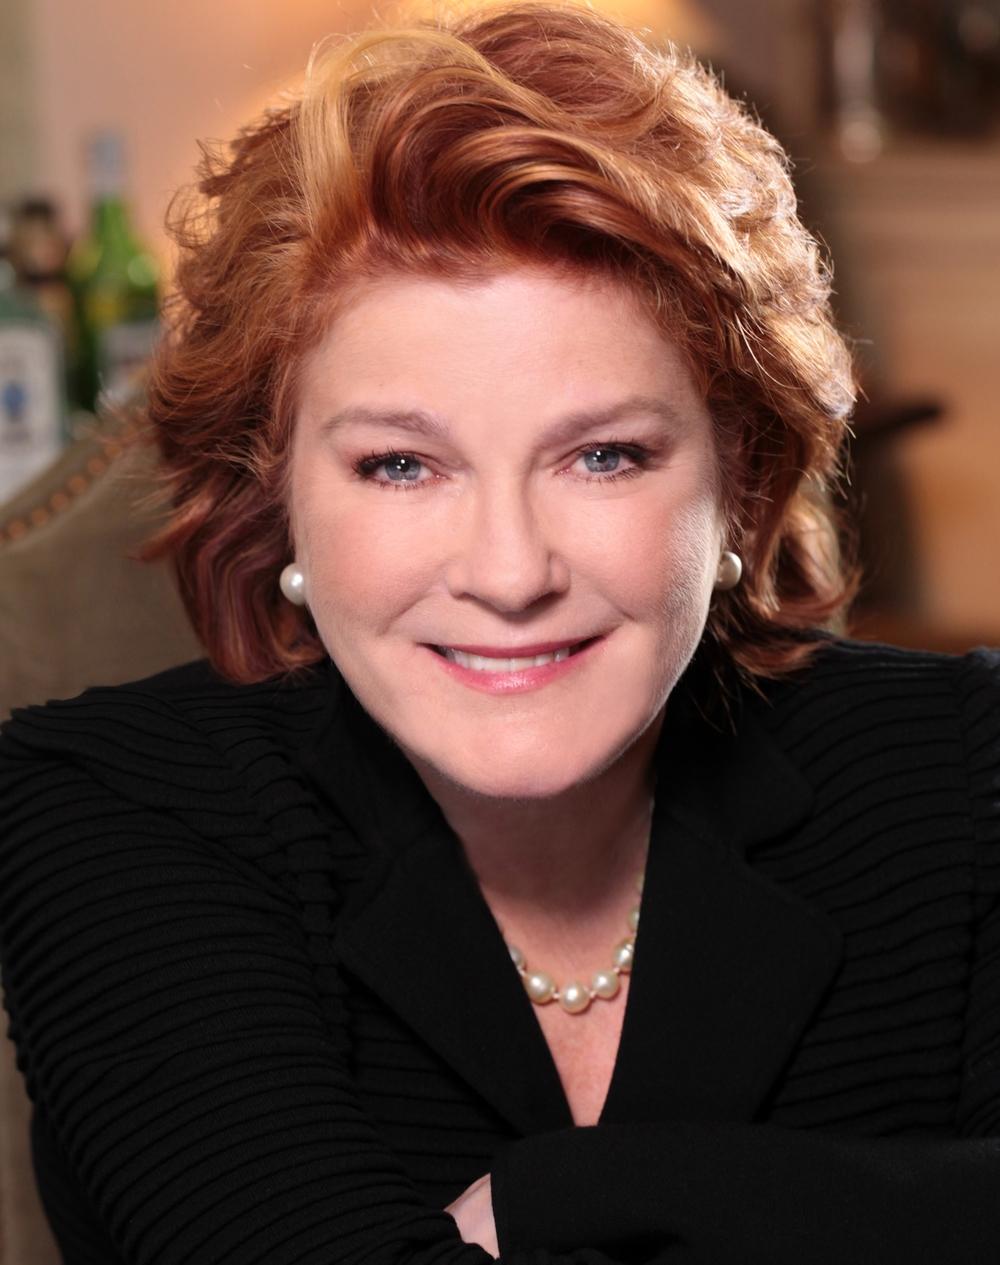 Kate Mulgrew, Actress